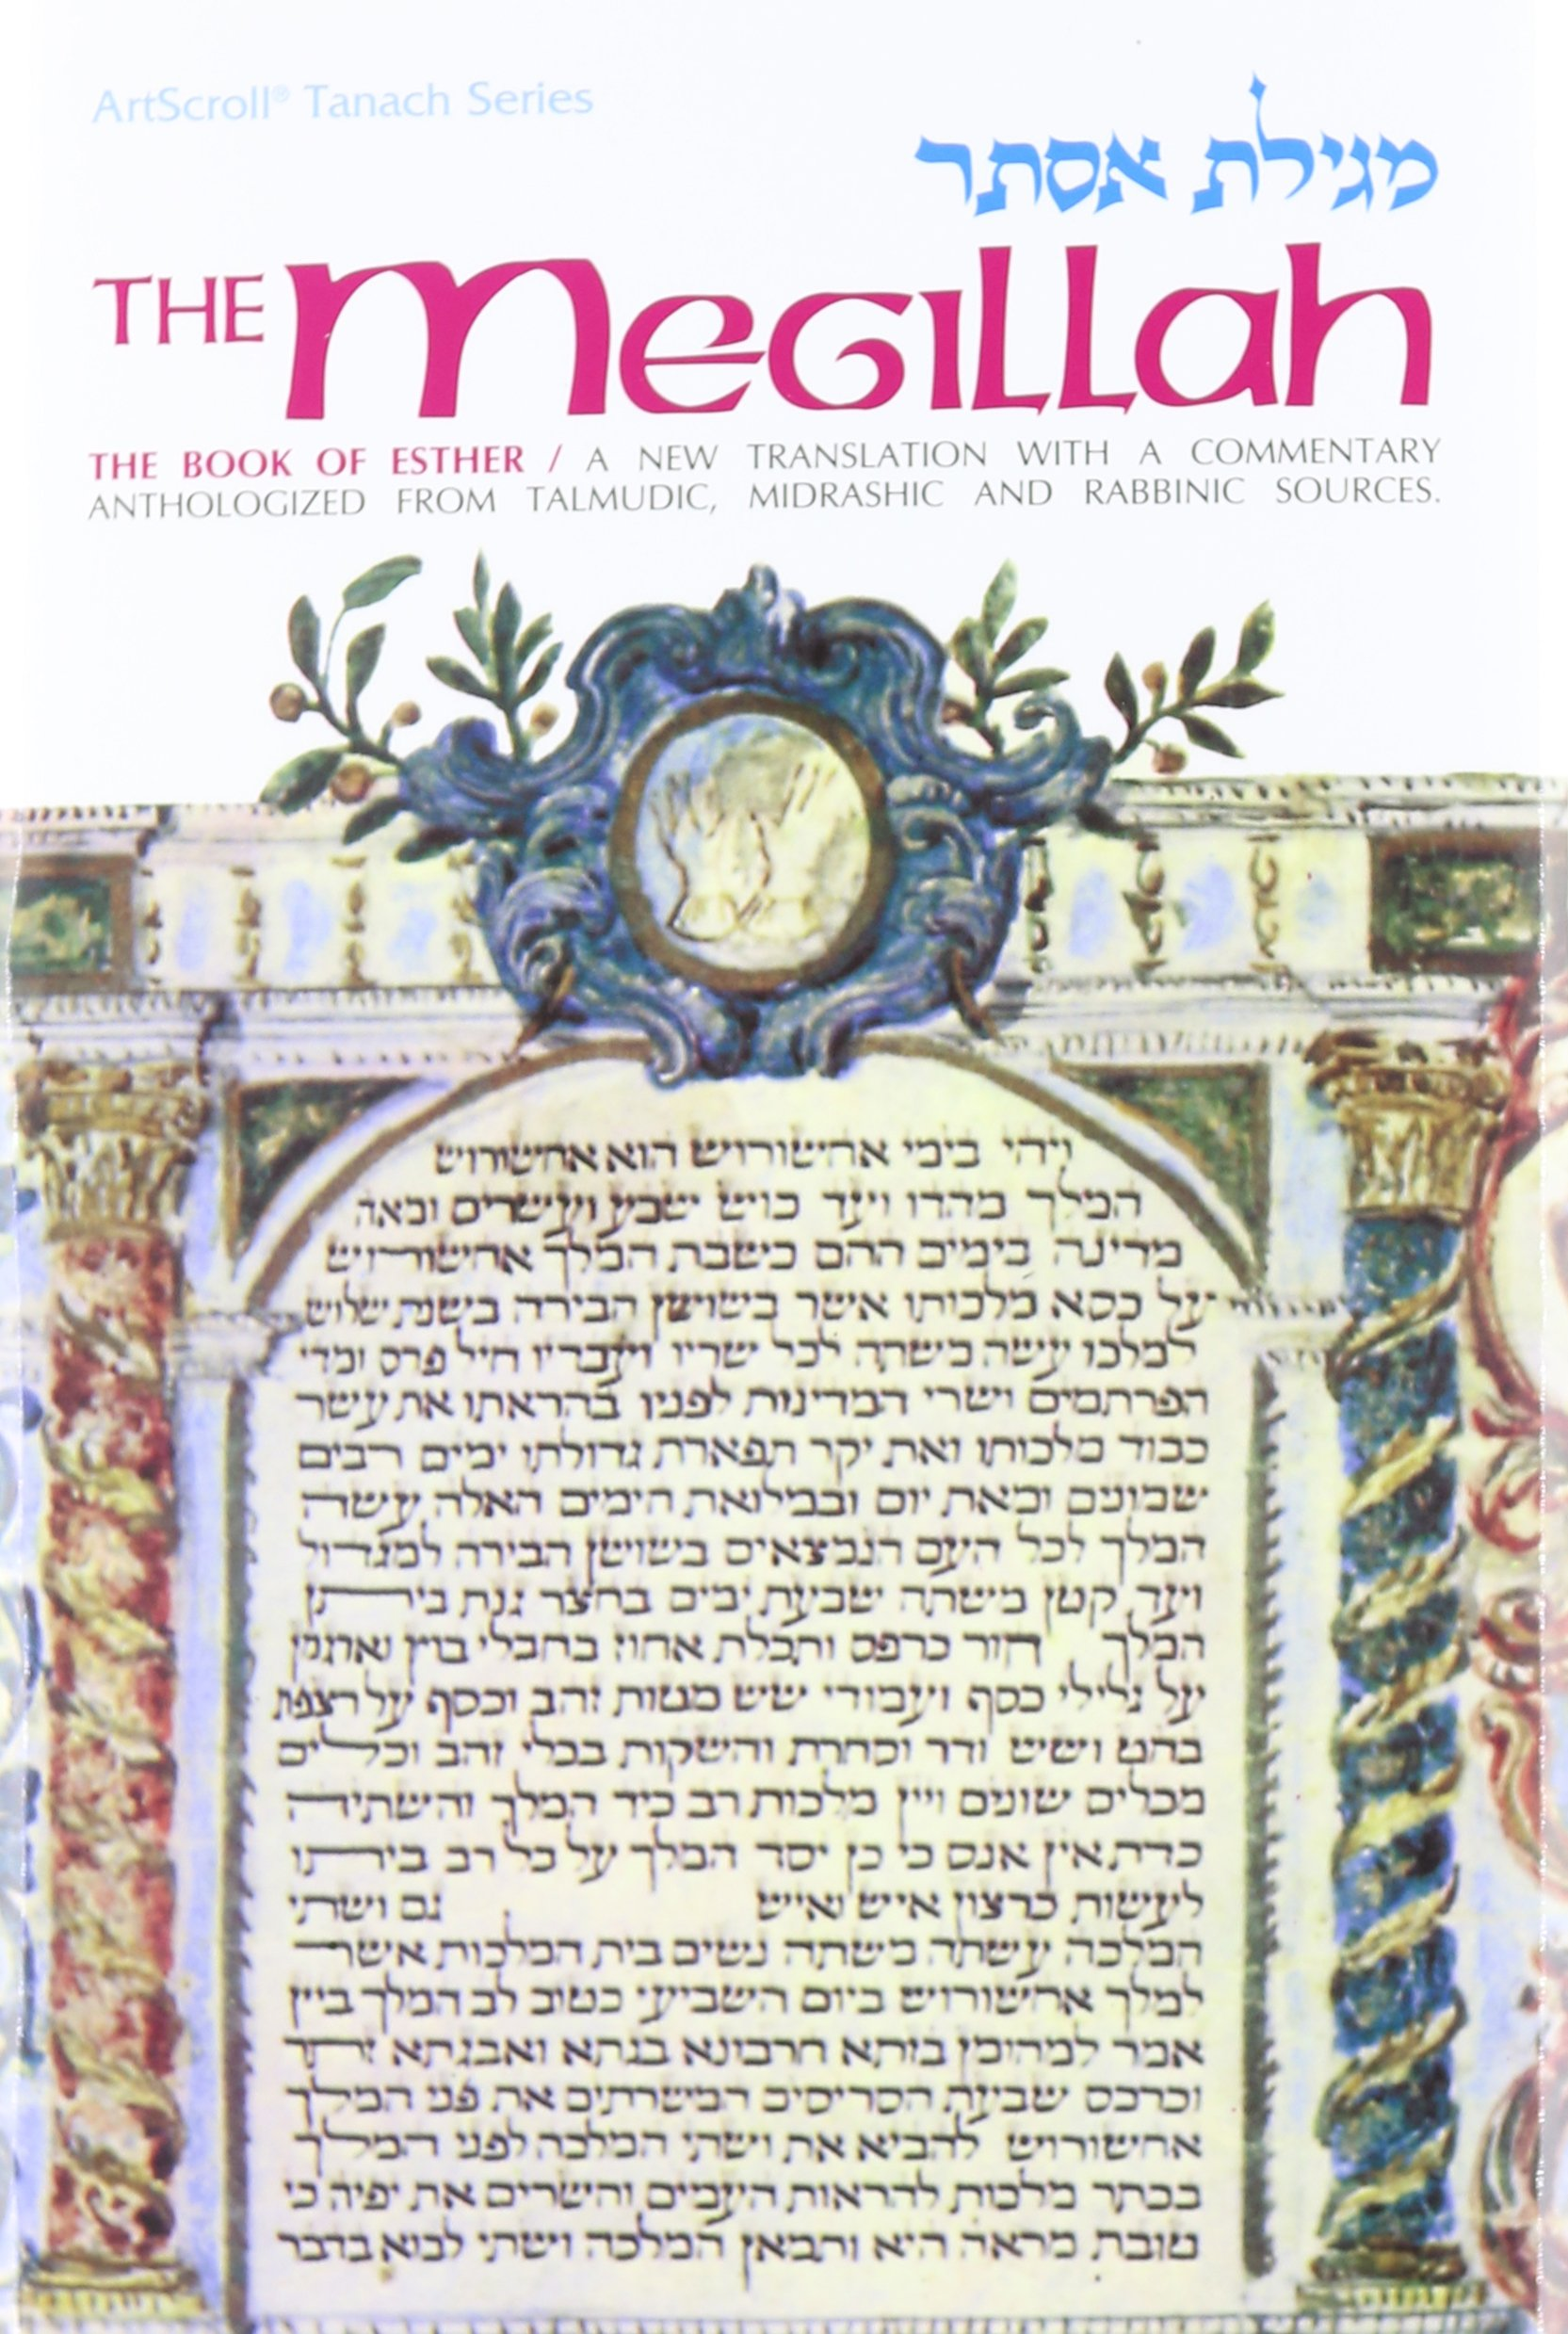 The Megillah